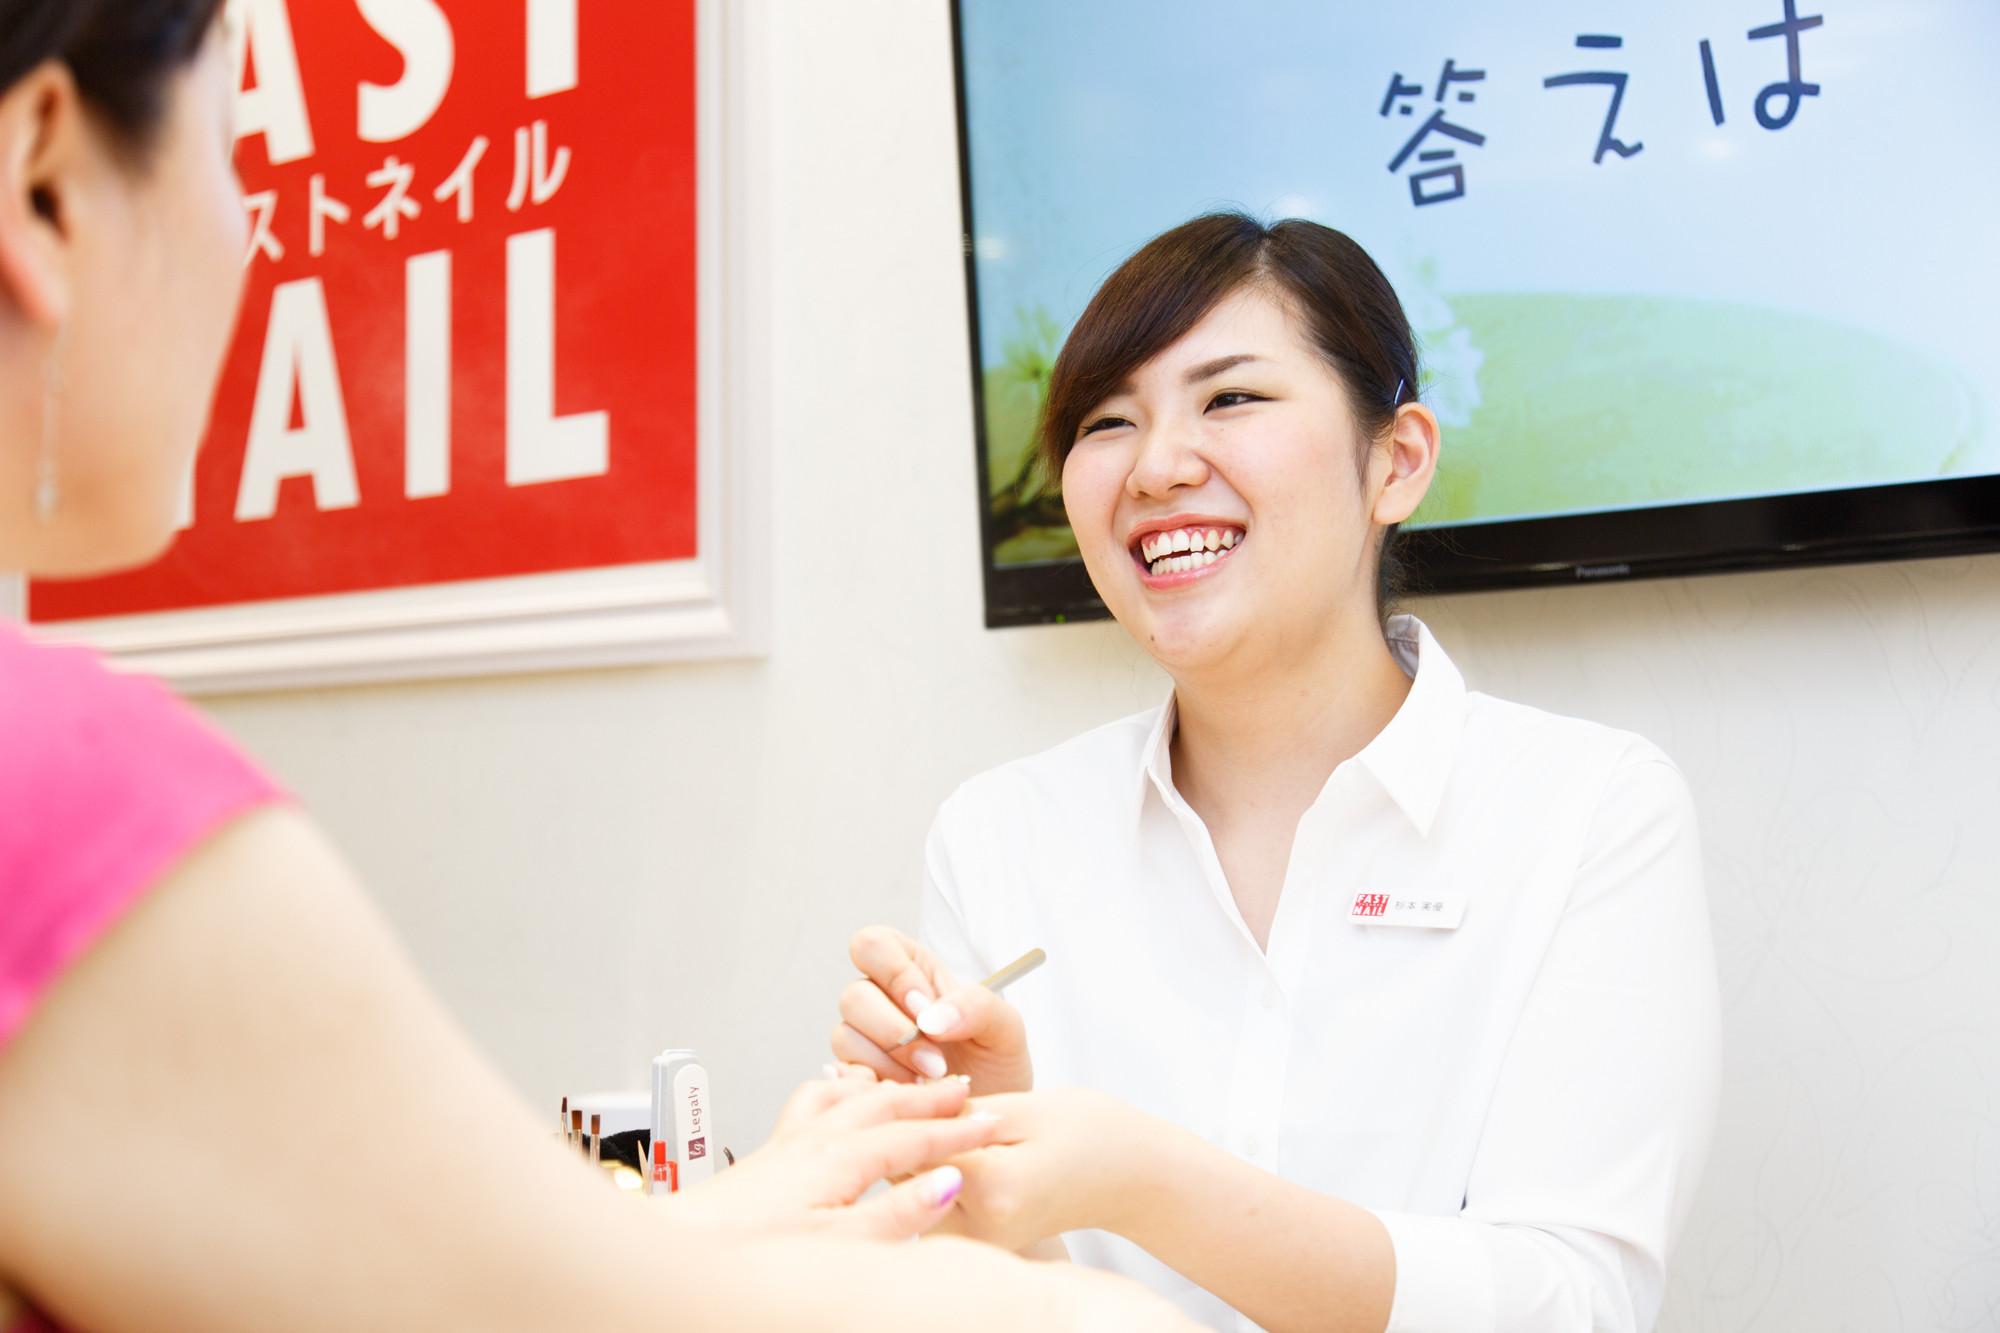 FASTNAIL(ファストネイル) 川崎店 のアルバイト情報